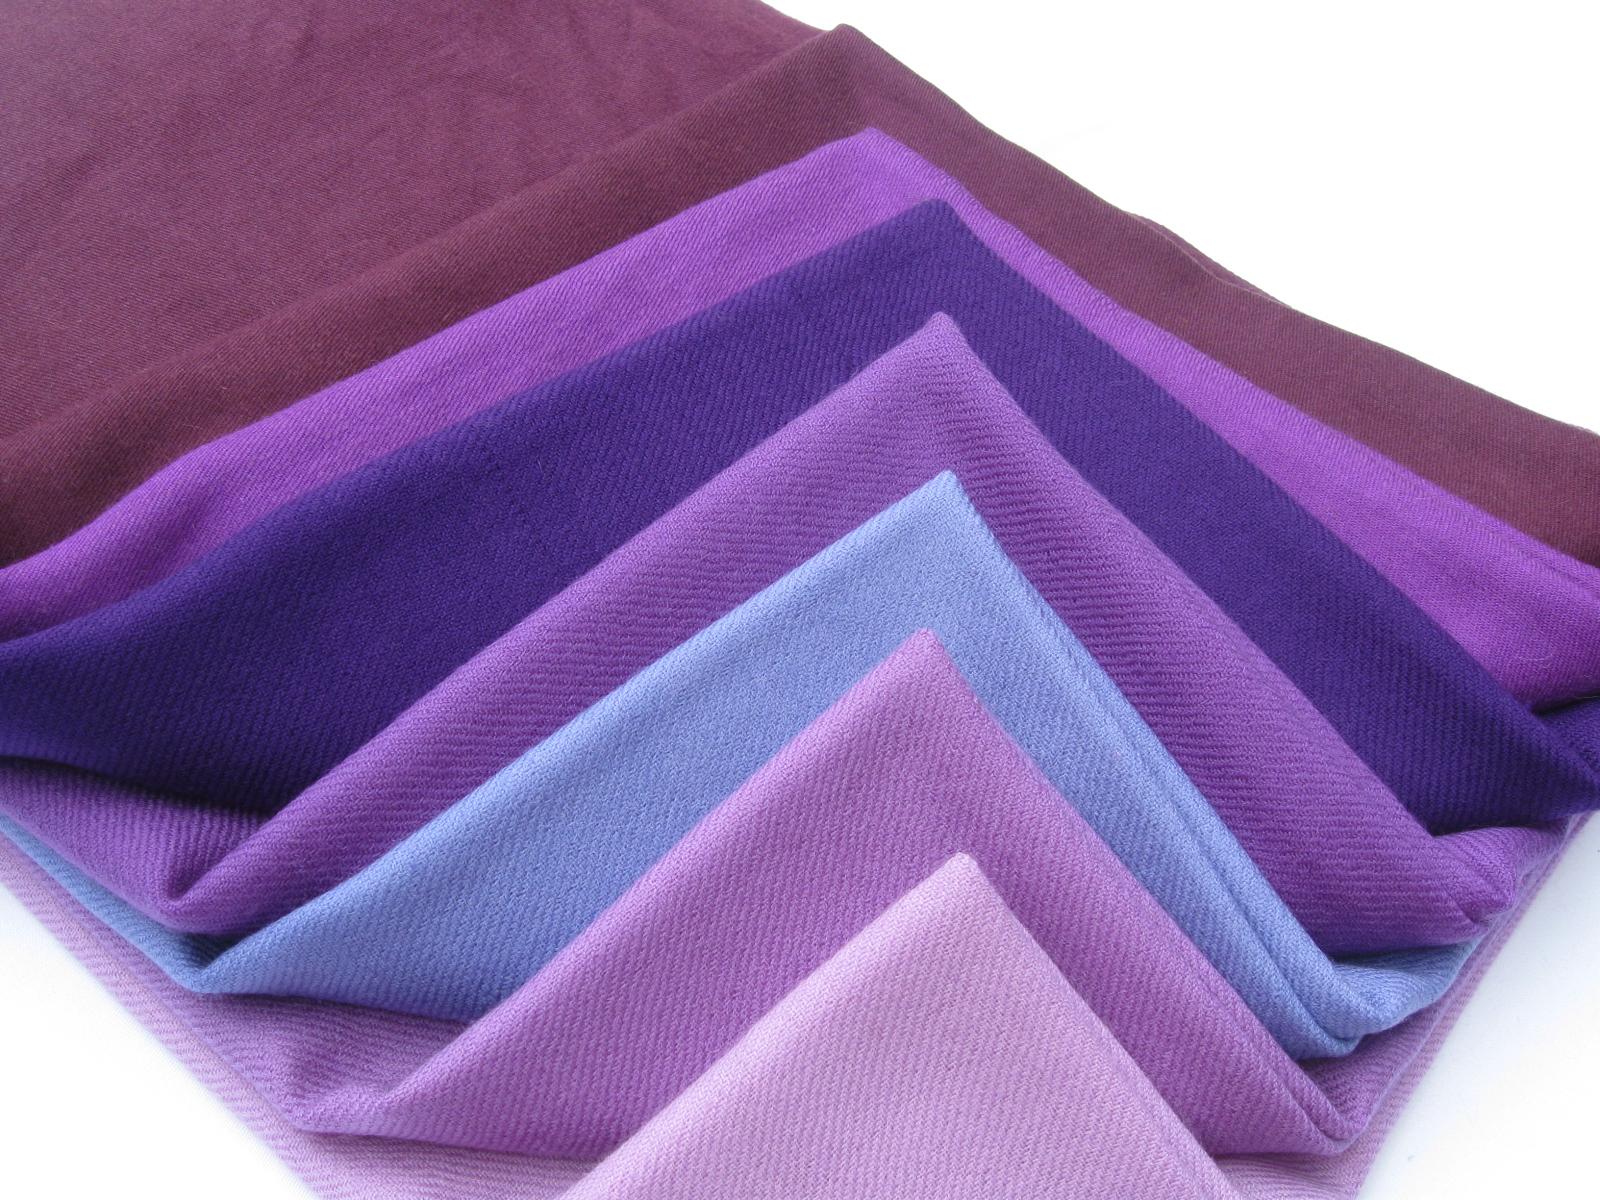 cashmere,cashmeres,pashmina,pashminas,pashima,shawl,shawls,scarf,scarves,scarfs,stole,stoles,fur,furs,shrug,shrugs,Ruana,Ruanas,silk scarf,embroidery shawl,embroidery scarf,embroidery scarves,burberry